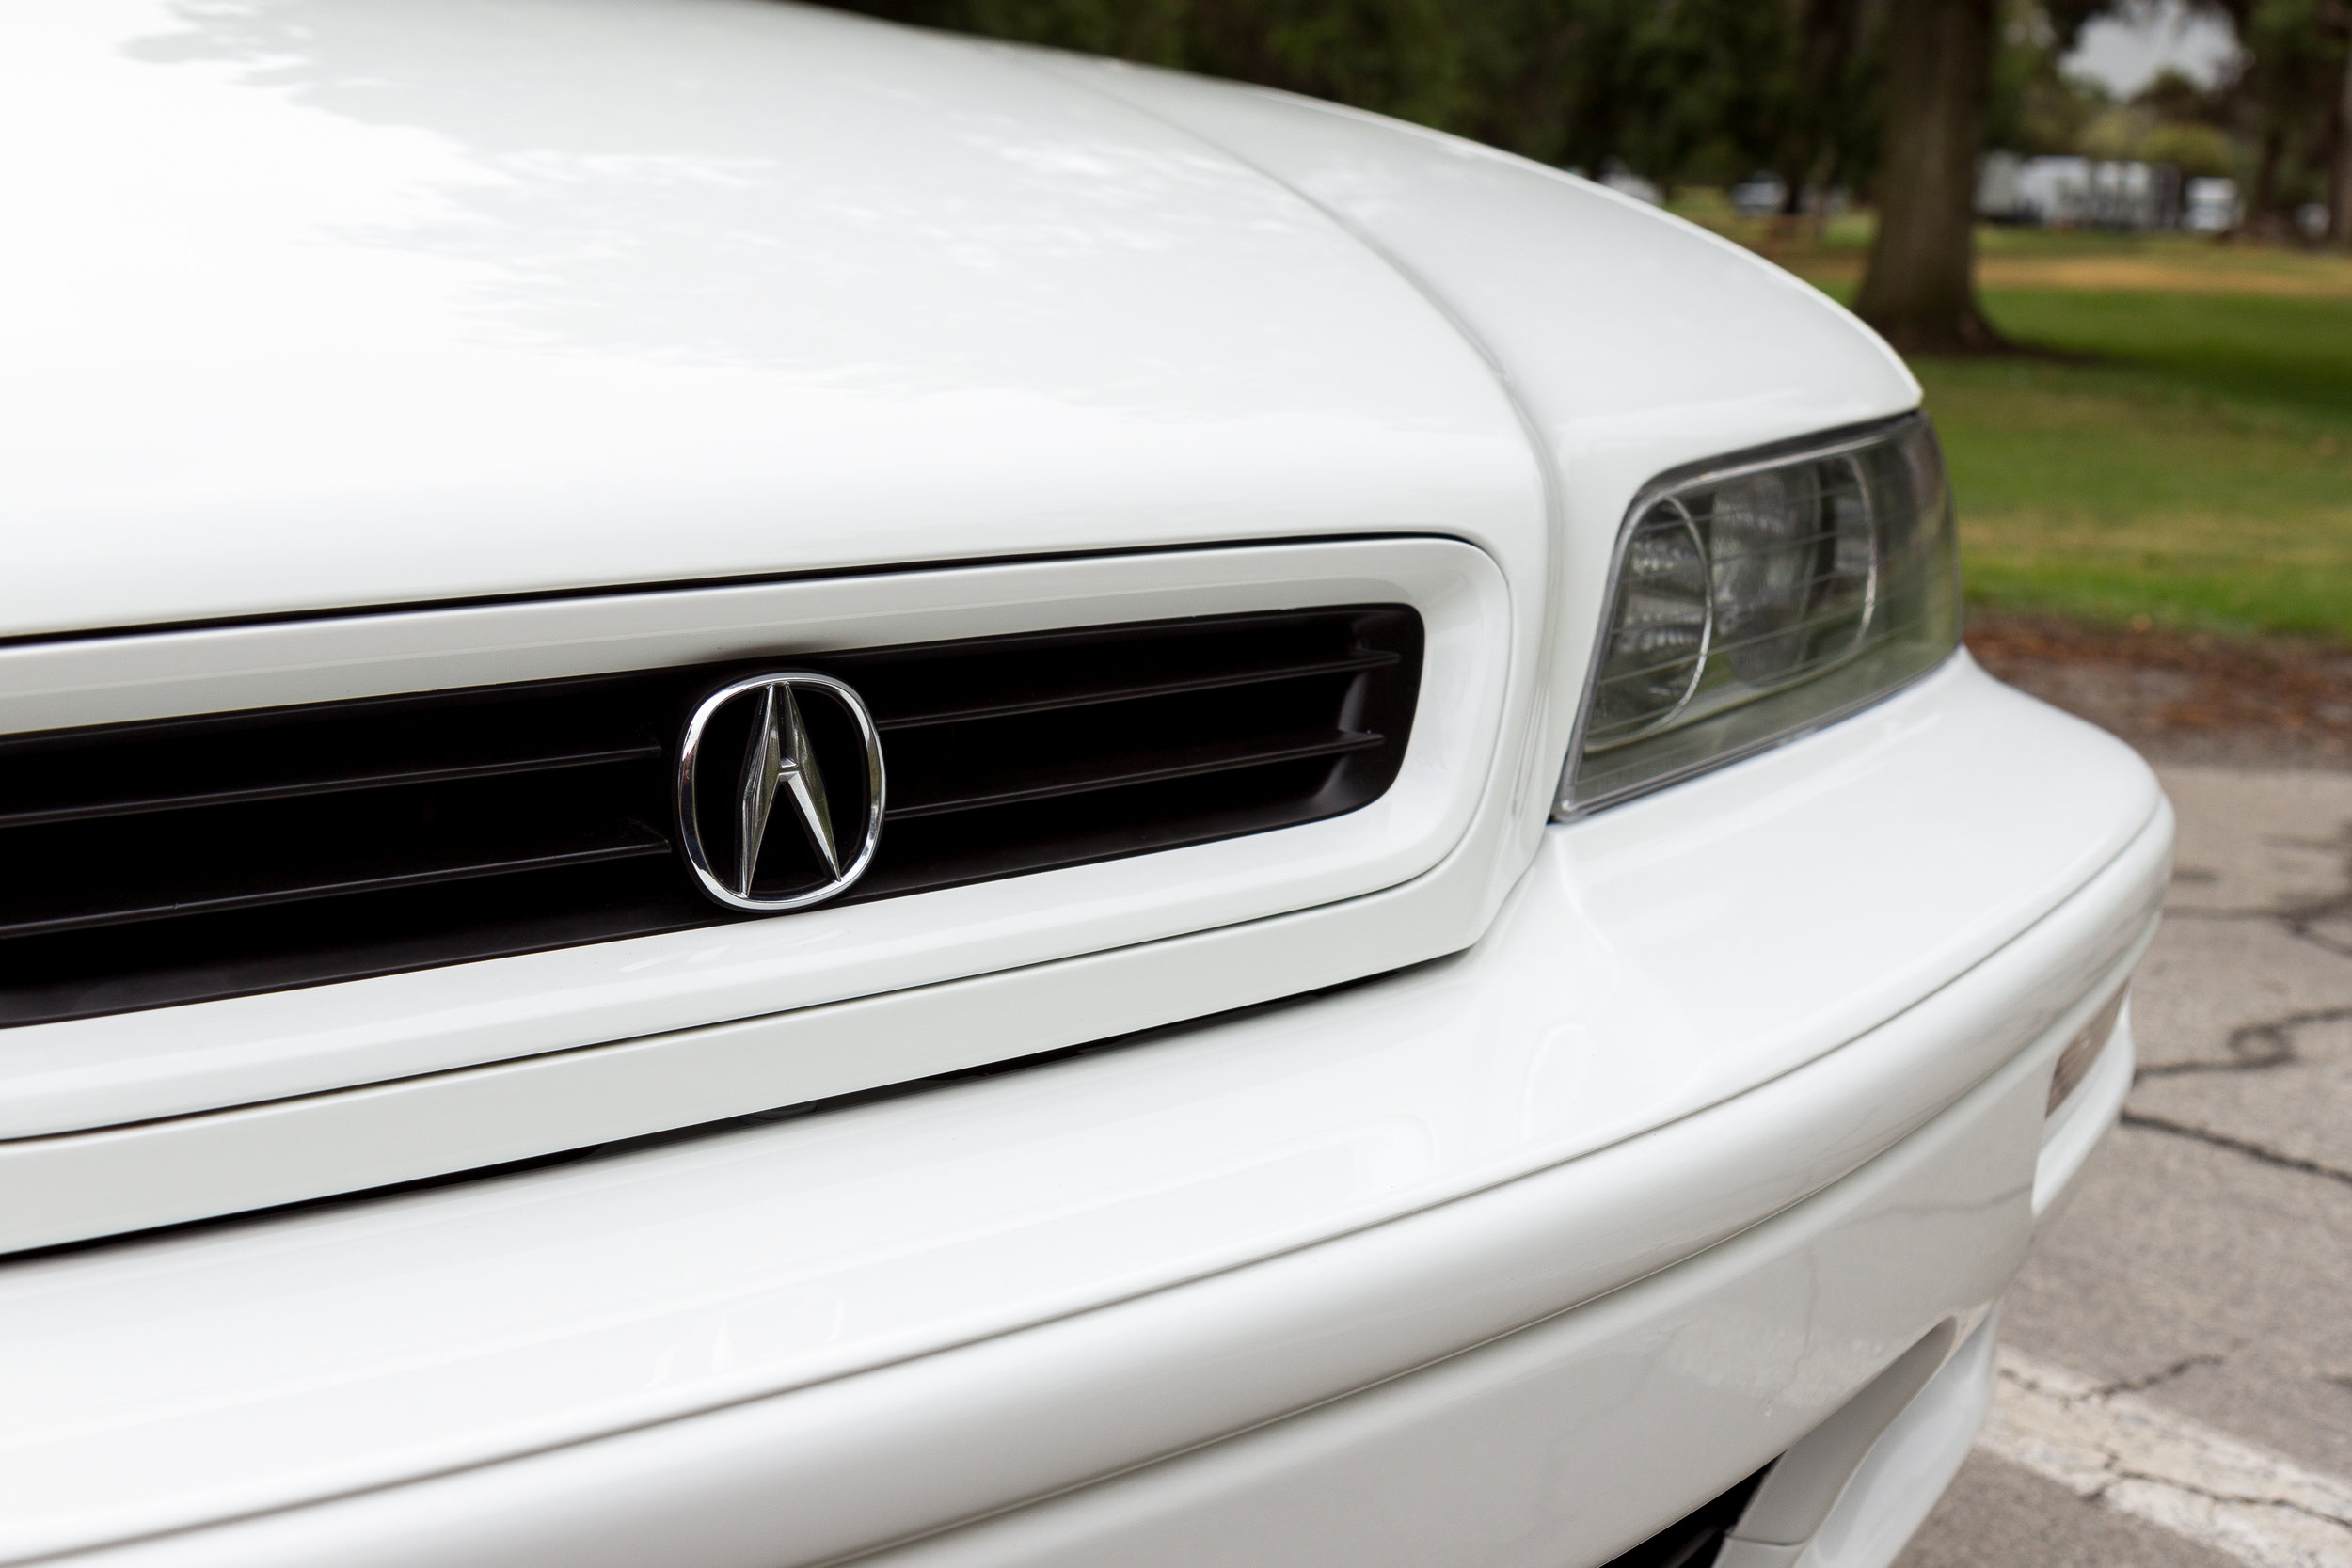 1994 Acura Legend Coupe-46.JPG